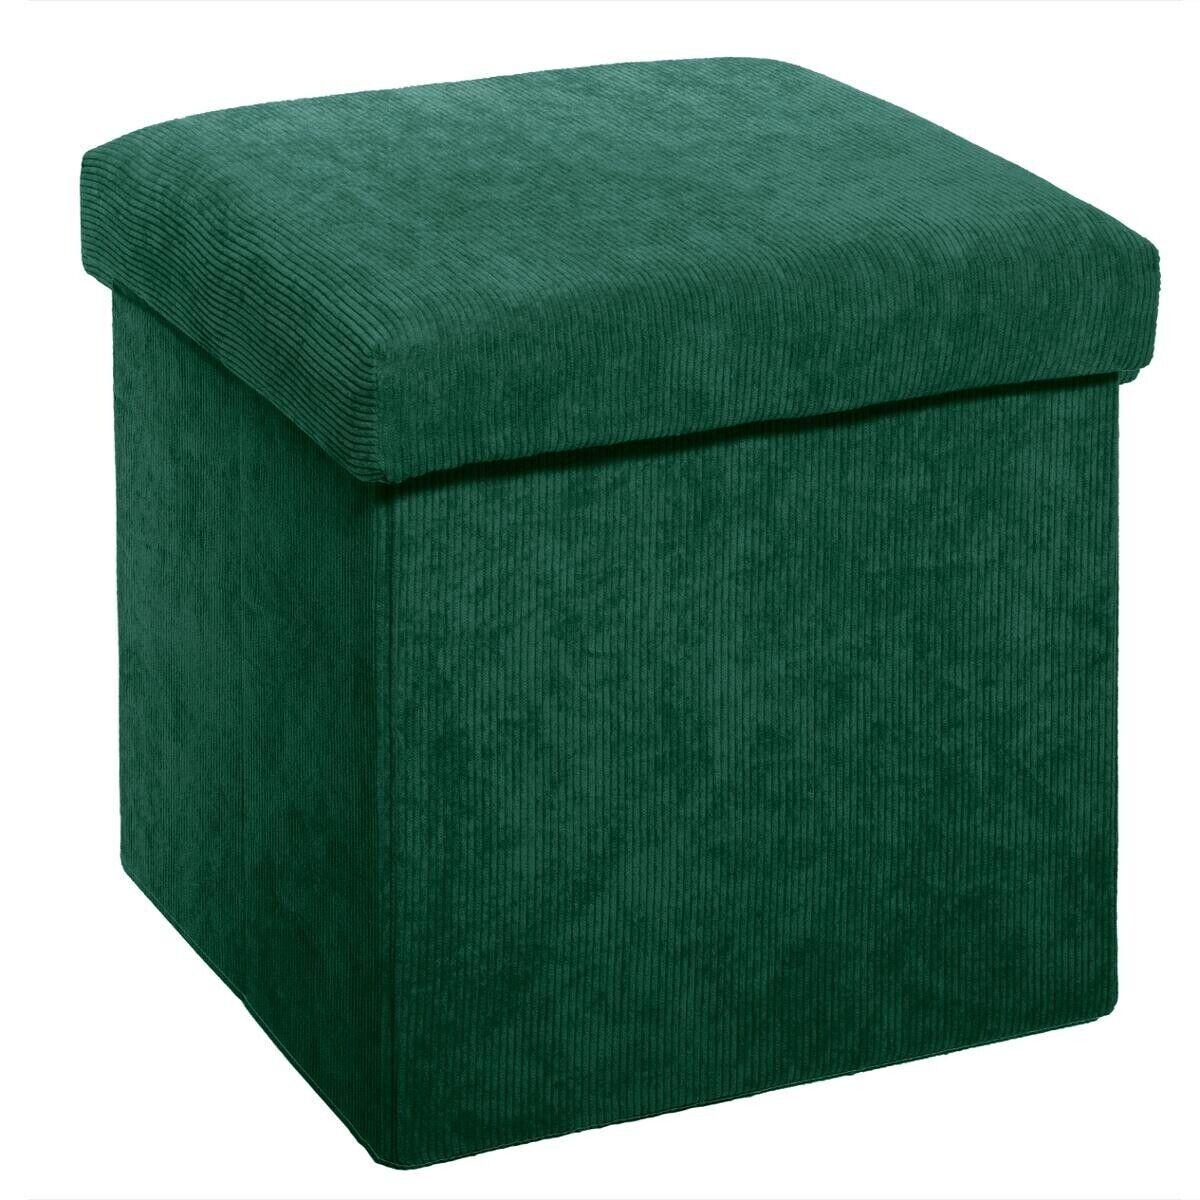 Atmosphera Pouf pliant vert en velours côtelé